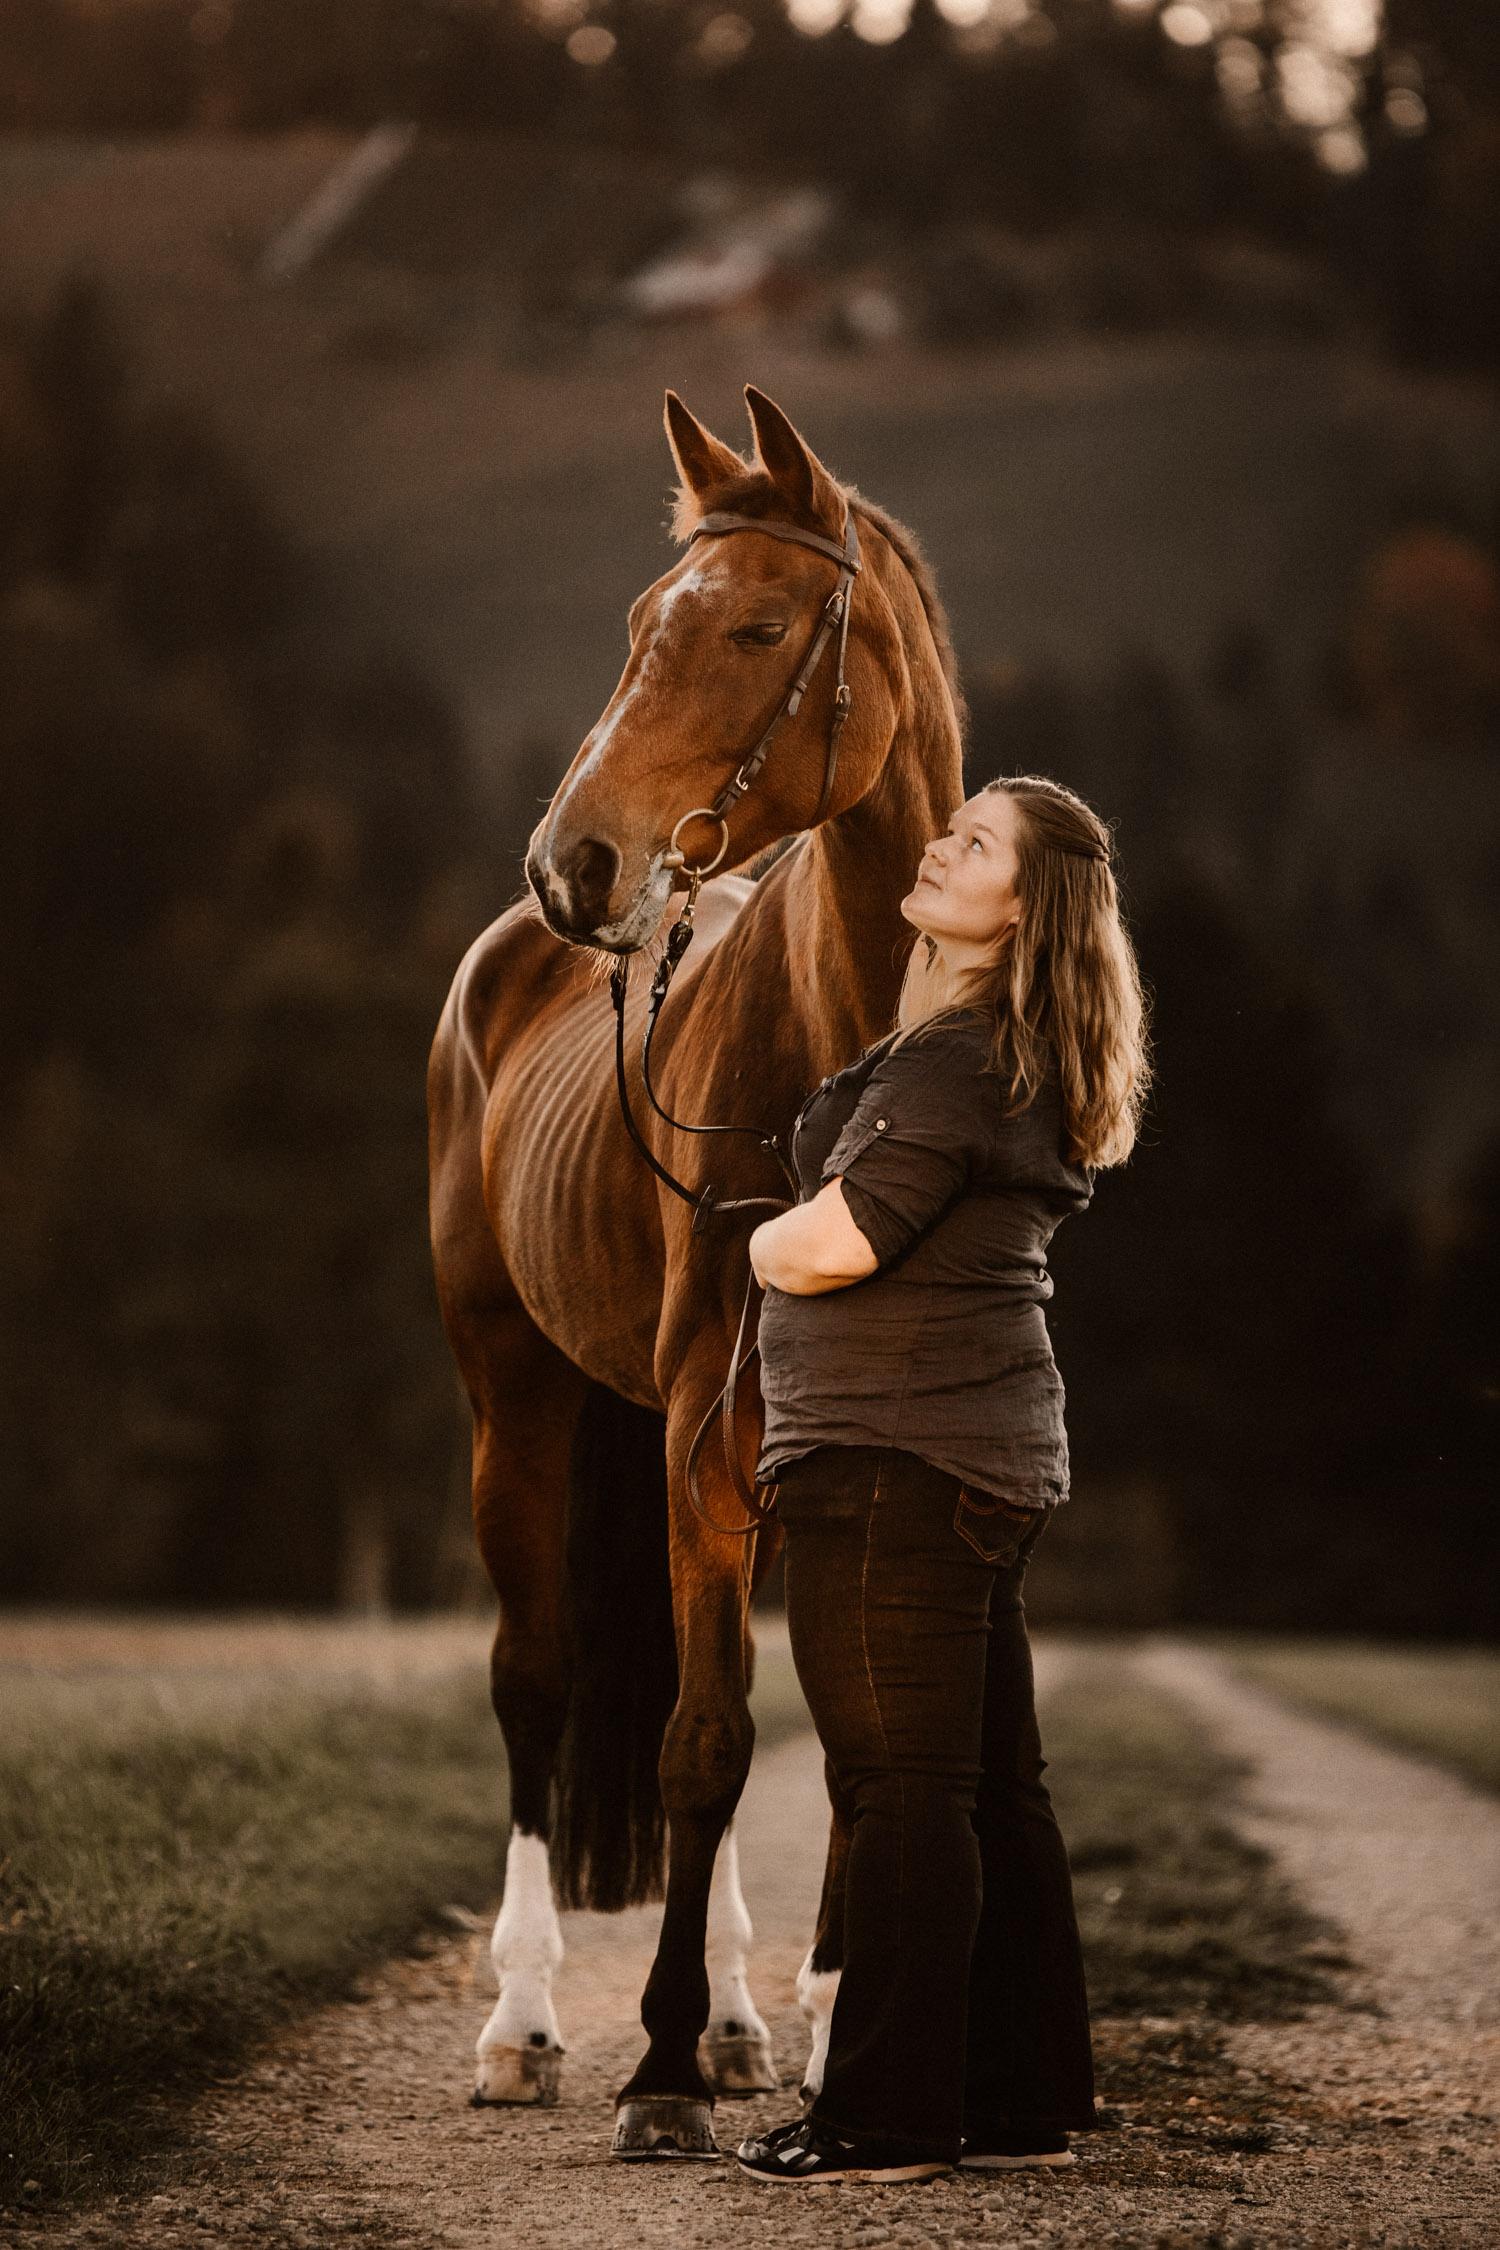 Pferdeshooting in Bern Schweiz Pferdefotografin natürliche Pferdefotos altes Pferd Stute Gegenlicht